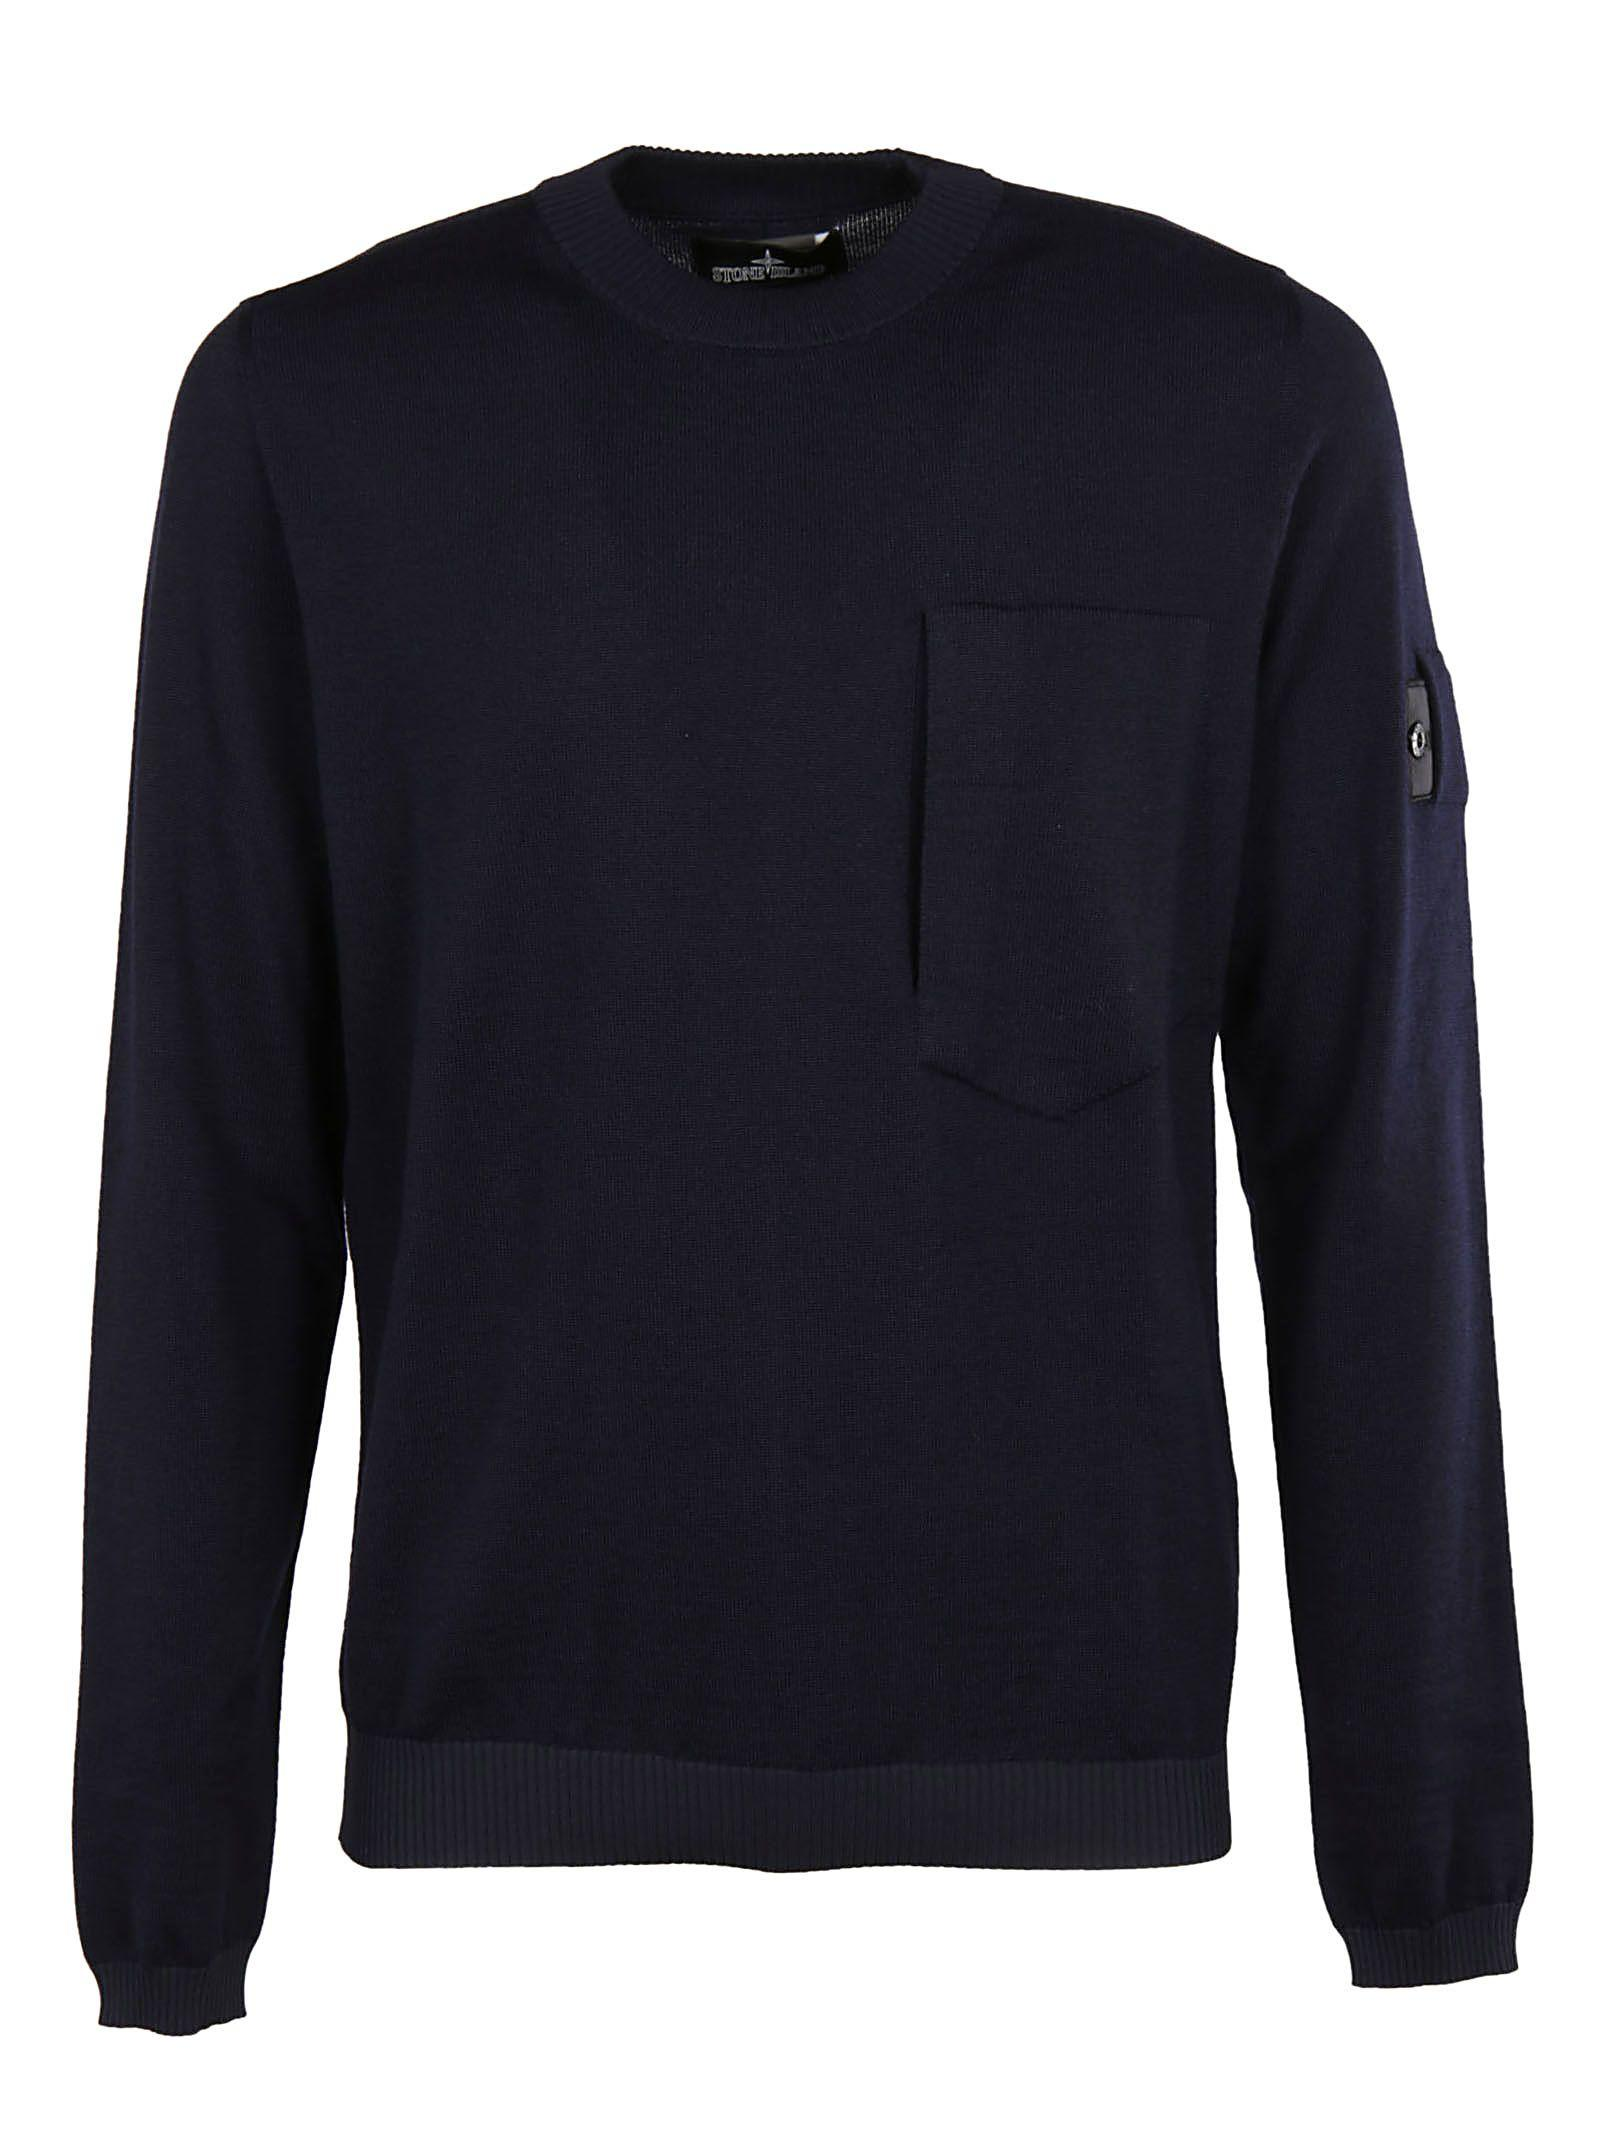 Stone Island Shadow Sleeve Detail Sweater In Blue